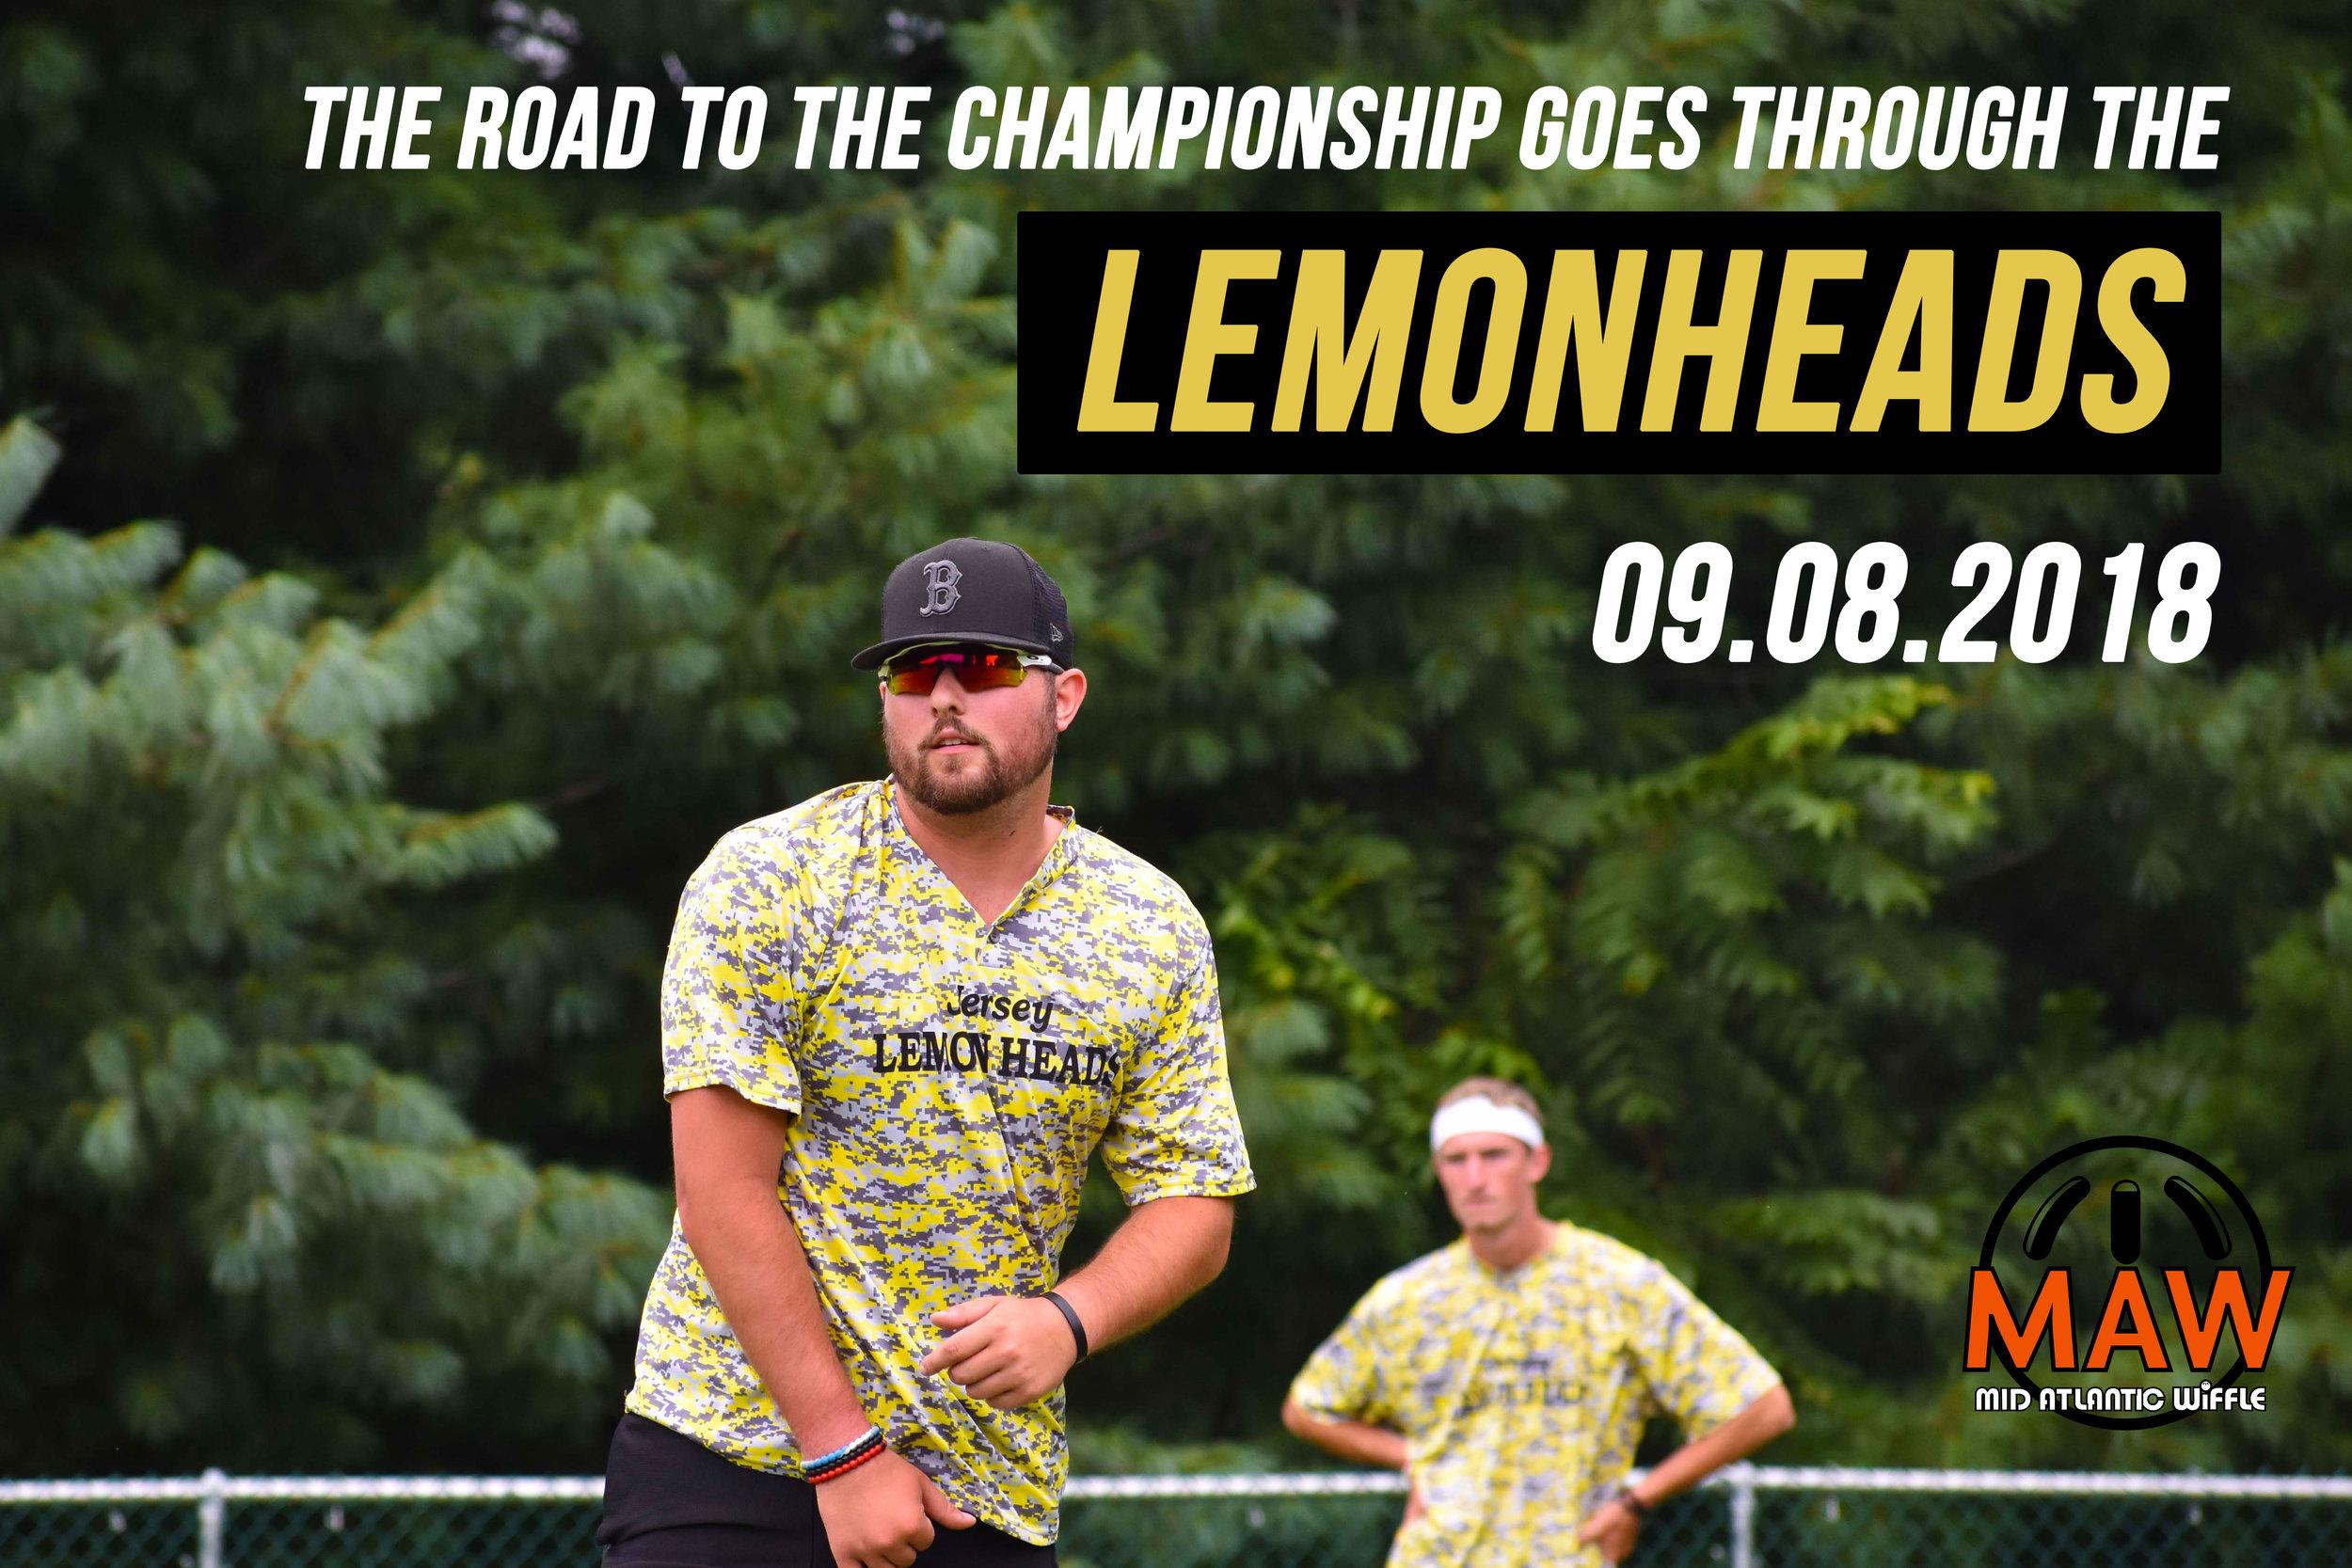 The-Road-to-...-Lemonheads.jpg